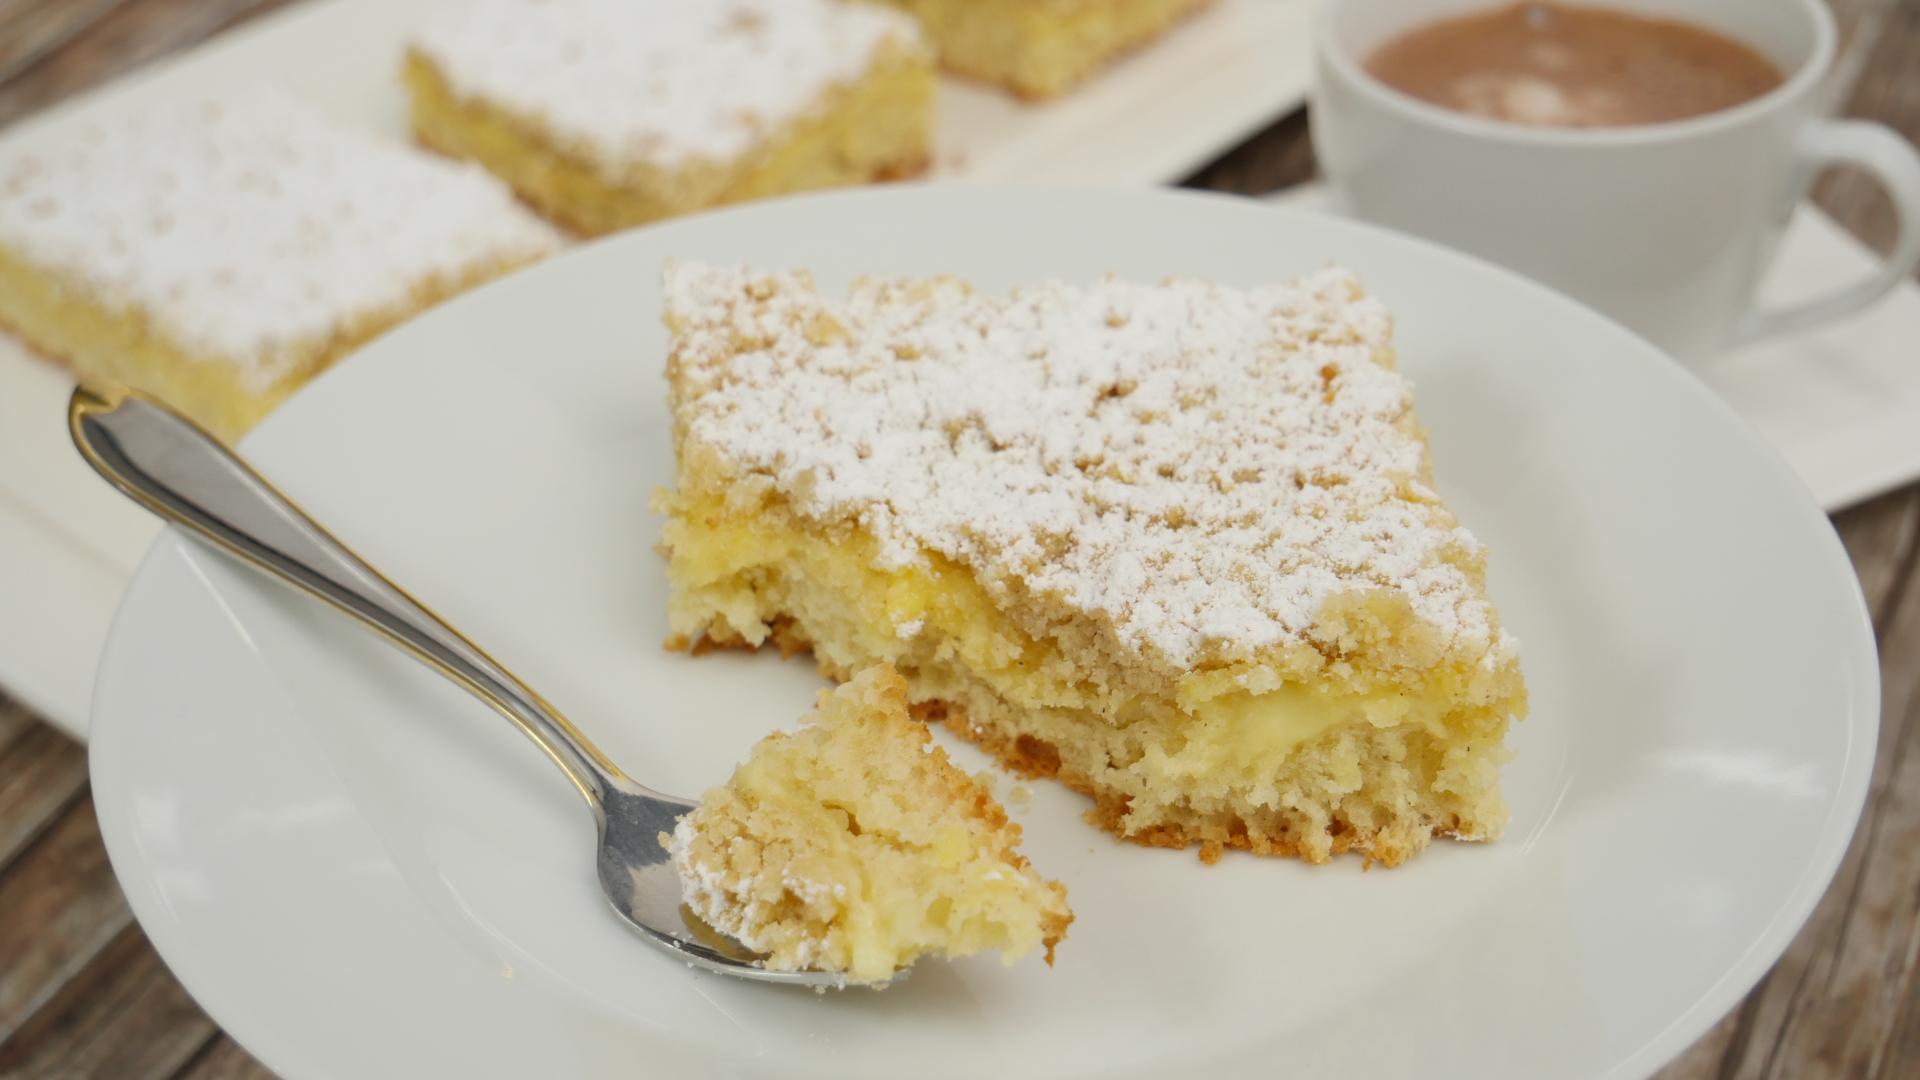 Rezept Streuselkuchen Mit Pudding Vom Blech I Blechkuchen I Pudding